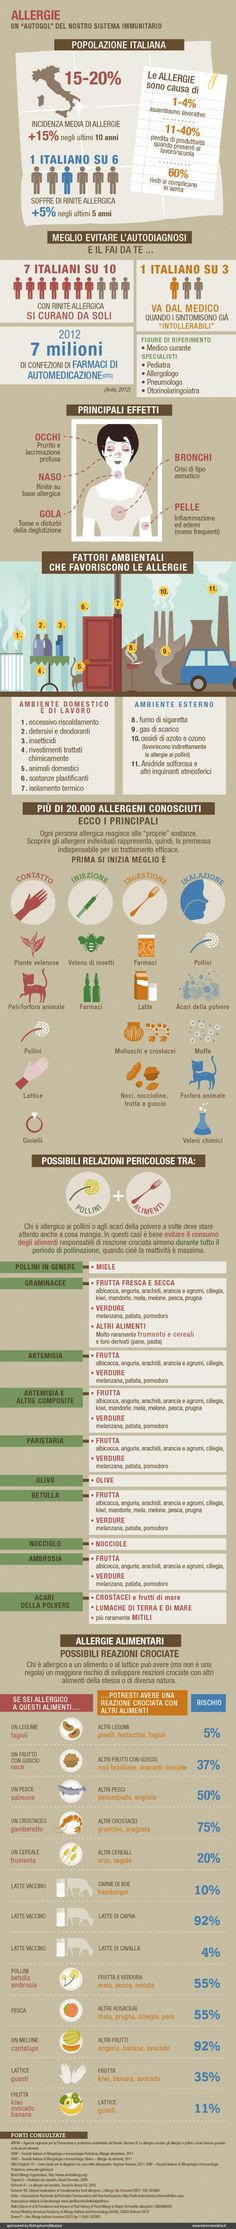 "Allergie: un ""autogol"" del nostro sistema immunitario - Esseredonnaonline"